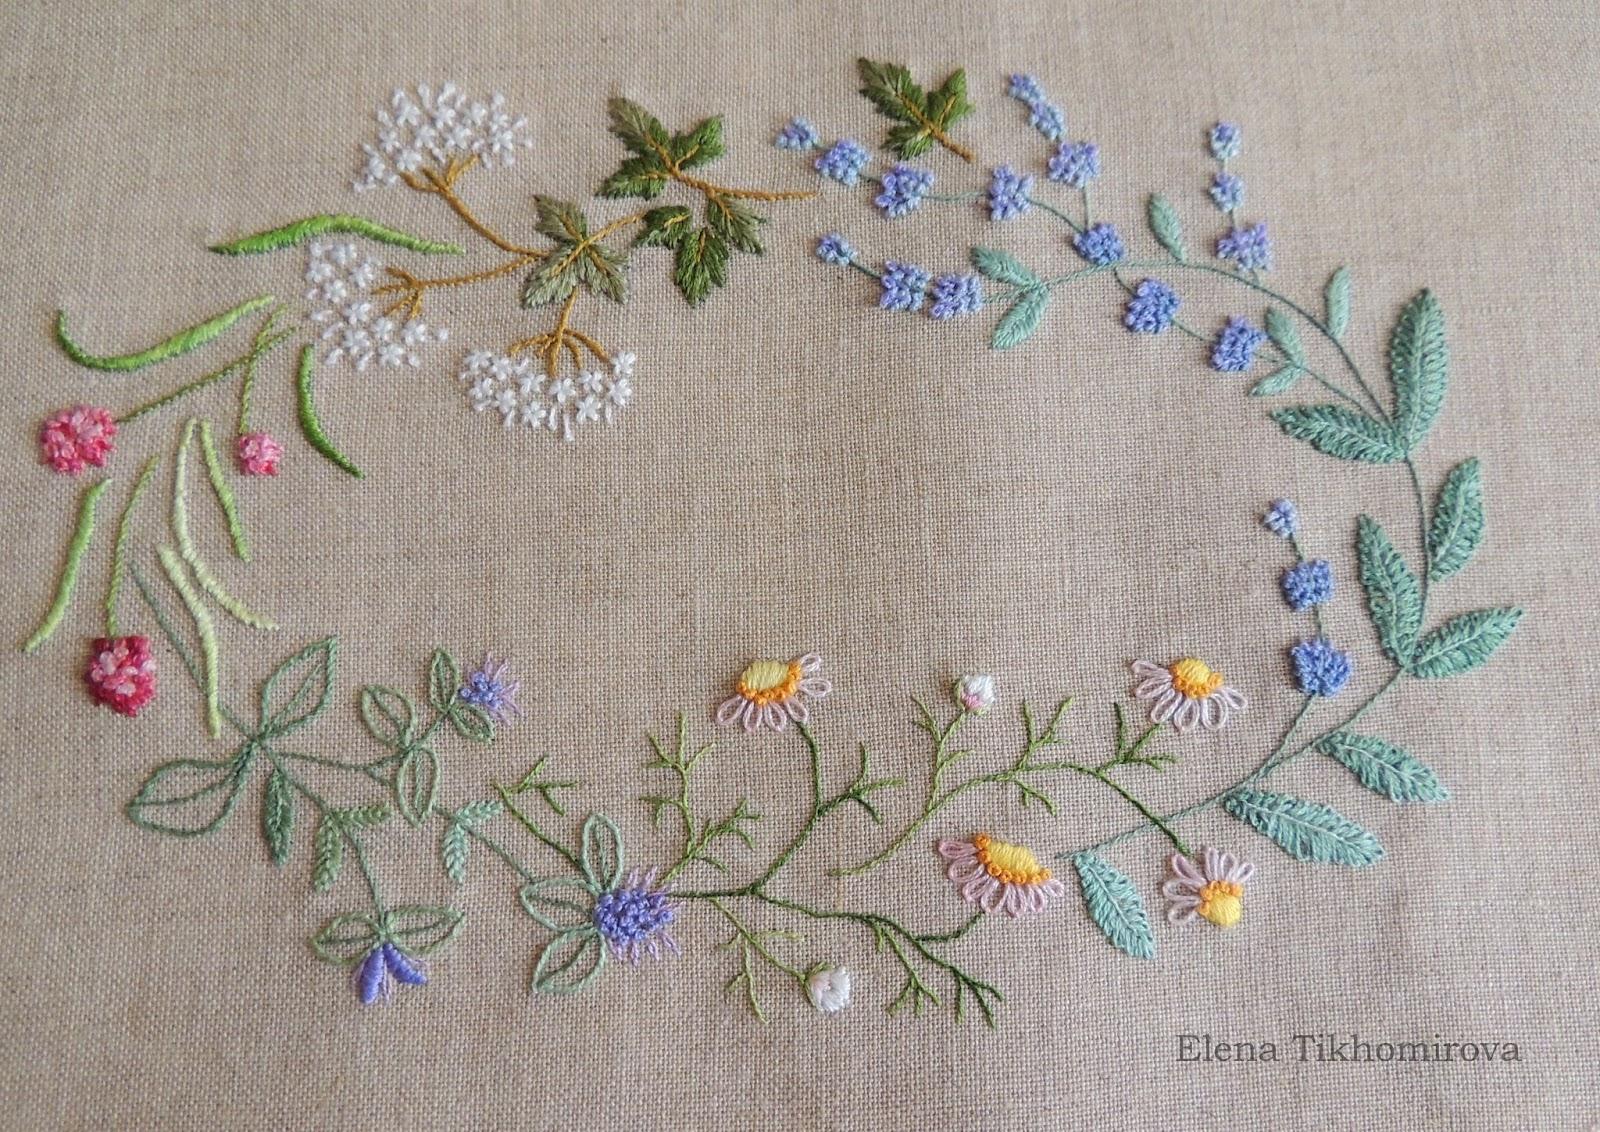 Herb Embroidery on Linen, Sadako Totsuka, блог Лаконичная вышивка